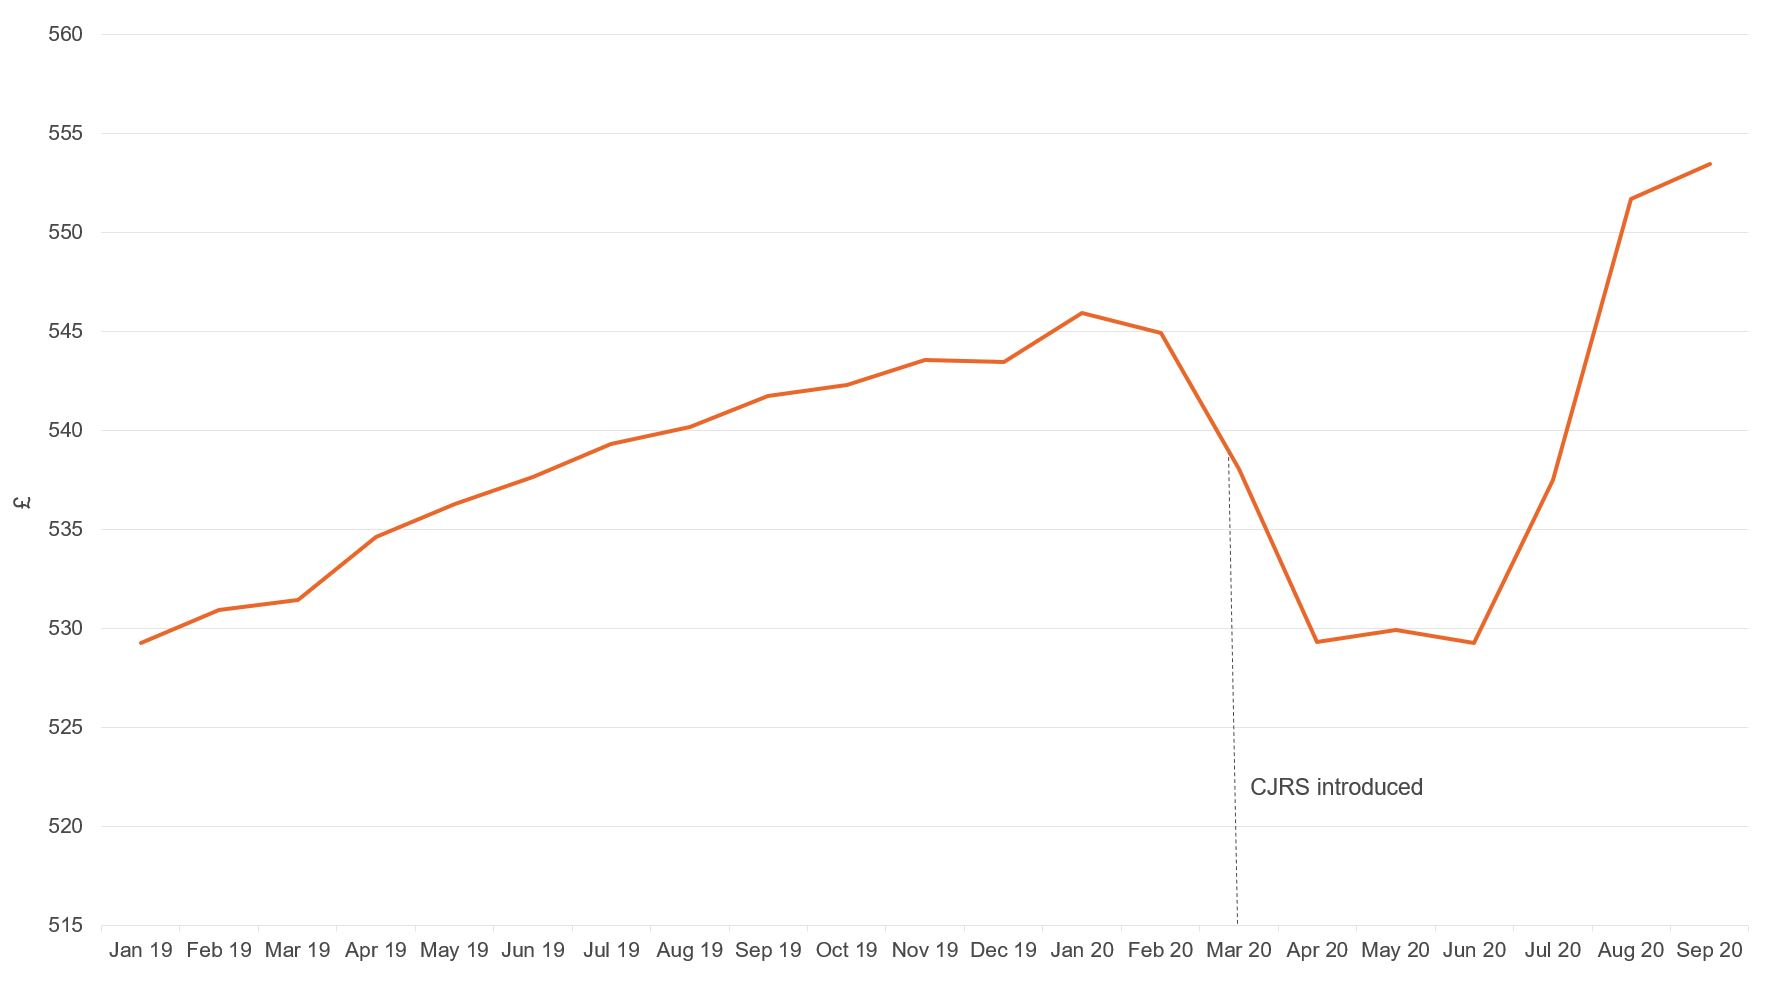 Figure showing average weekly earnings